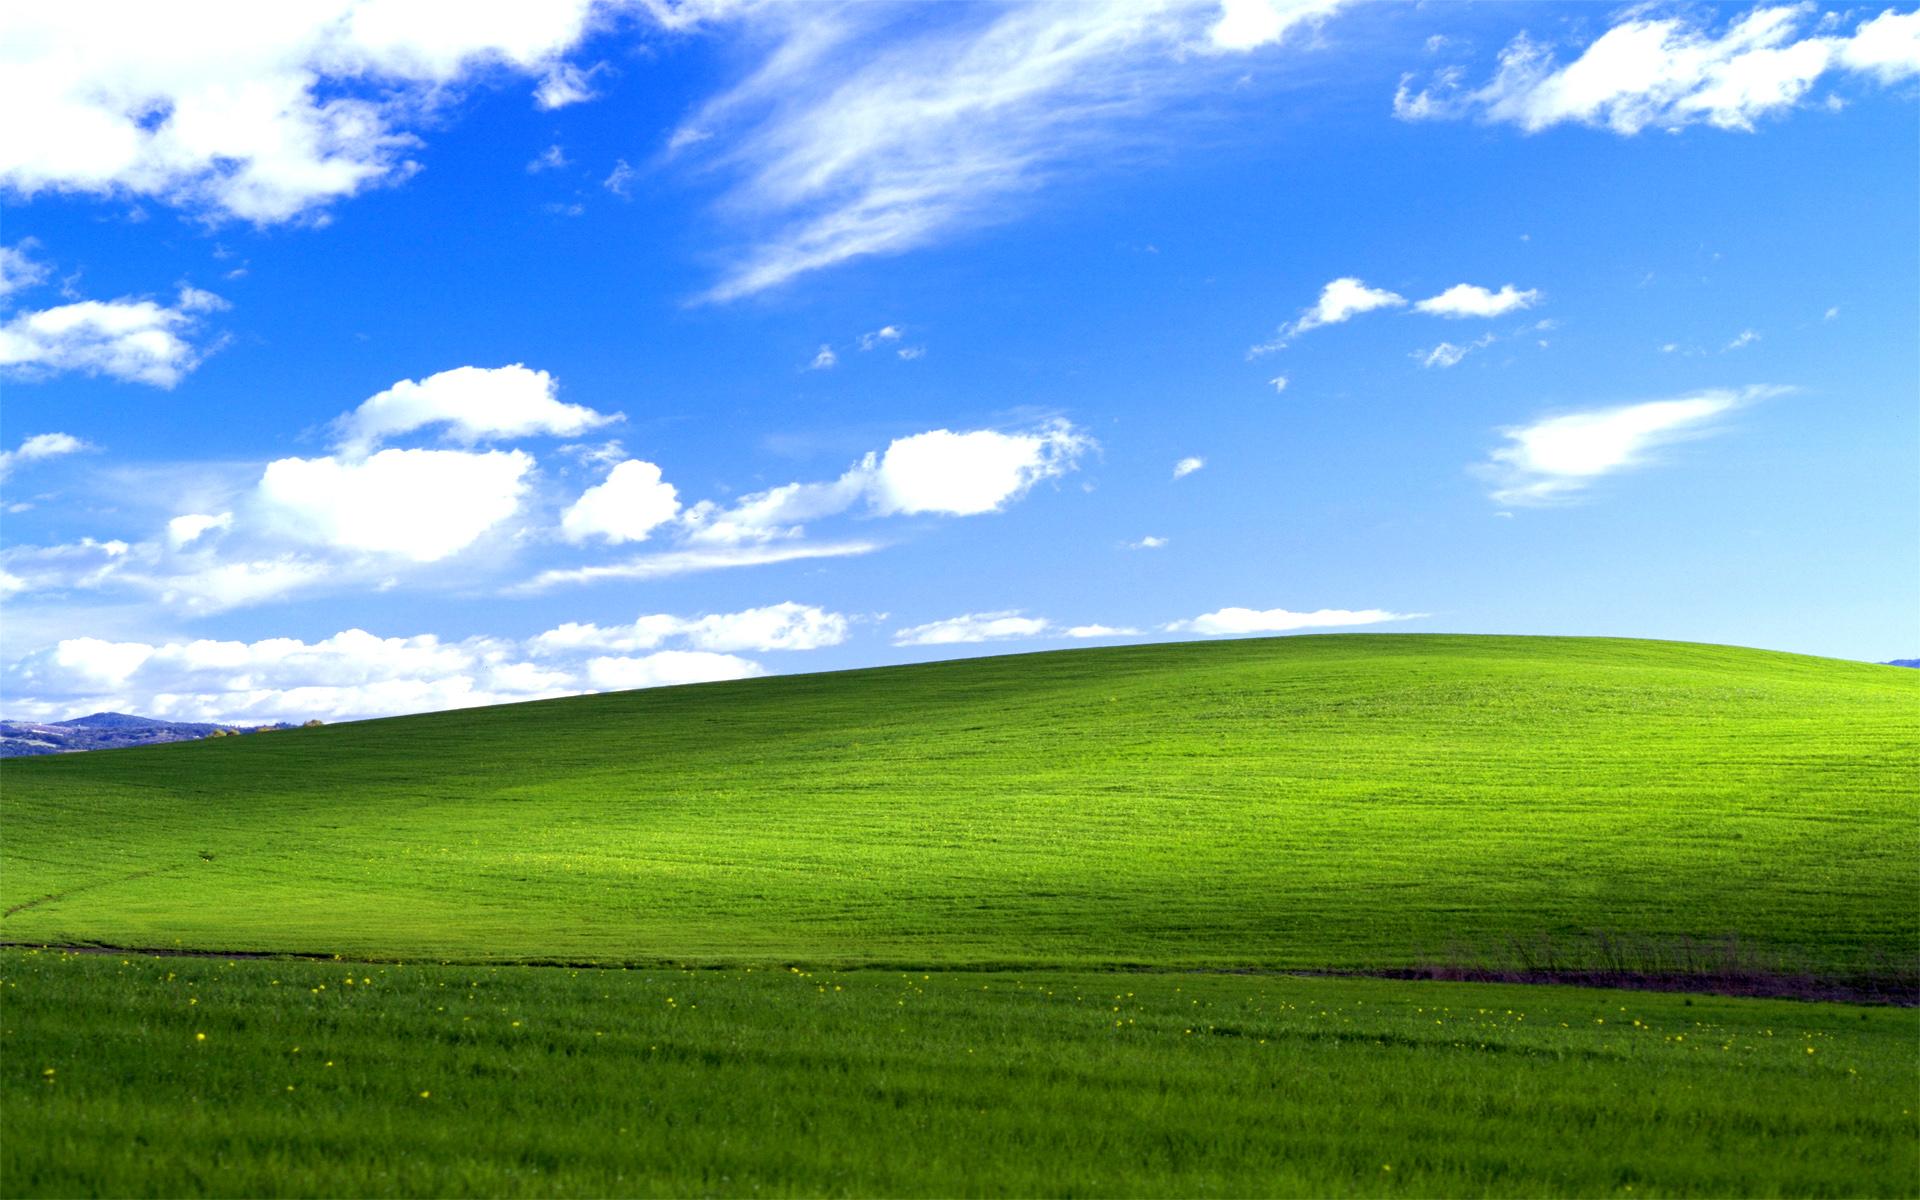 green landscape hd wallpaper | hd wallpapers | pinterest | cloud